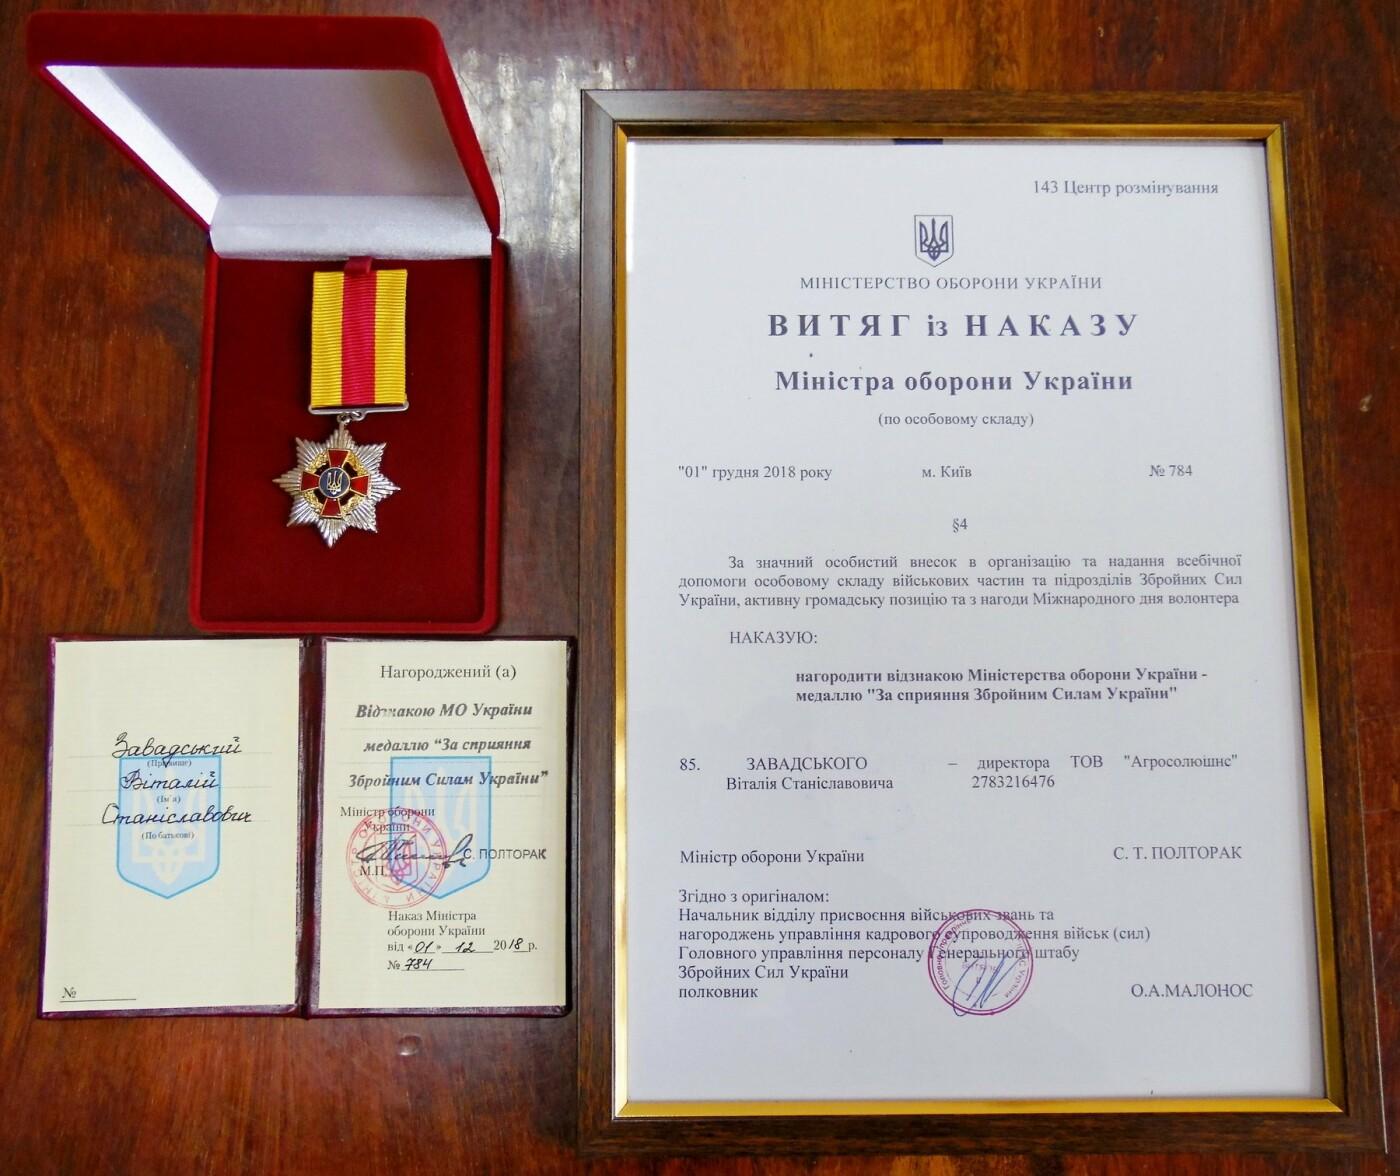 "Директор ТОВ ""Агросолюшнс"" нагороджений медаллю ""За сприяння Збройним Силам України"", фото-1"